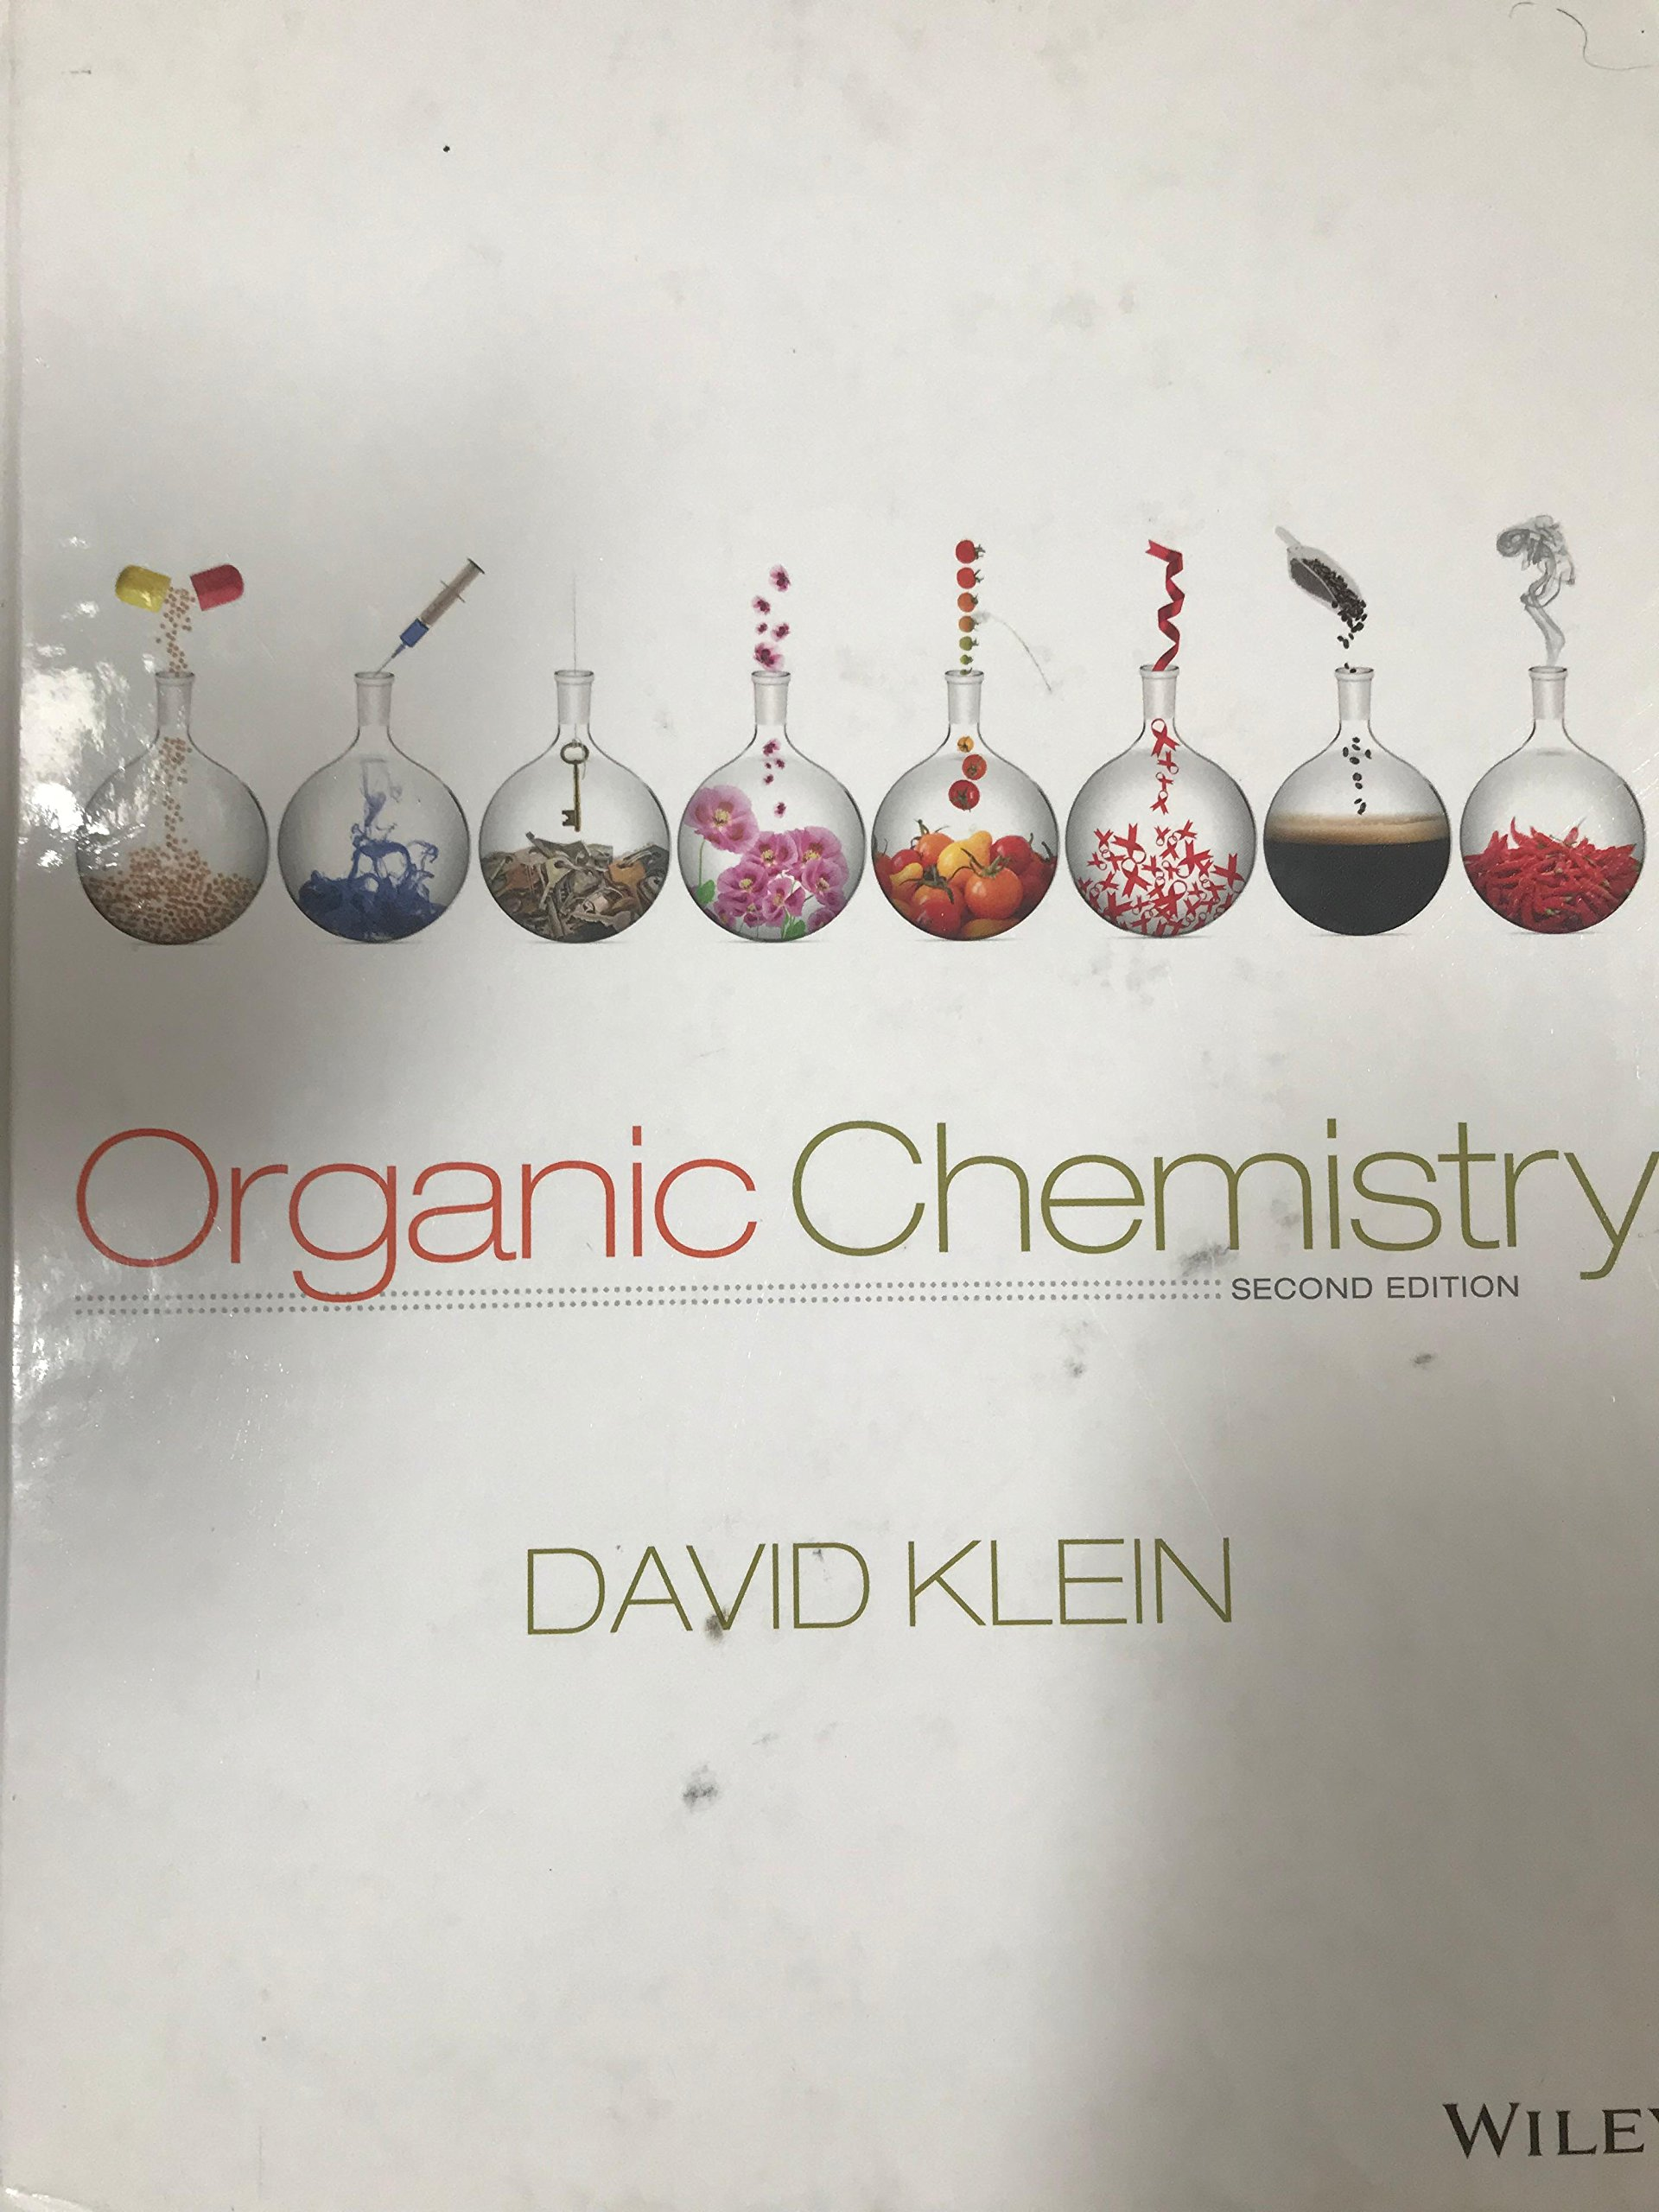 Organic Chemistry Second Edition: David Klein: 9781118452288: Amazon.com:  Books